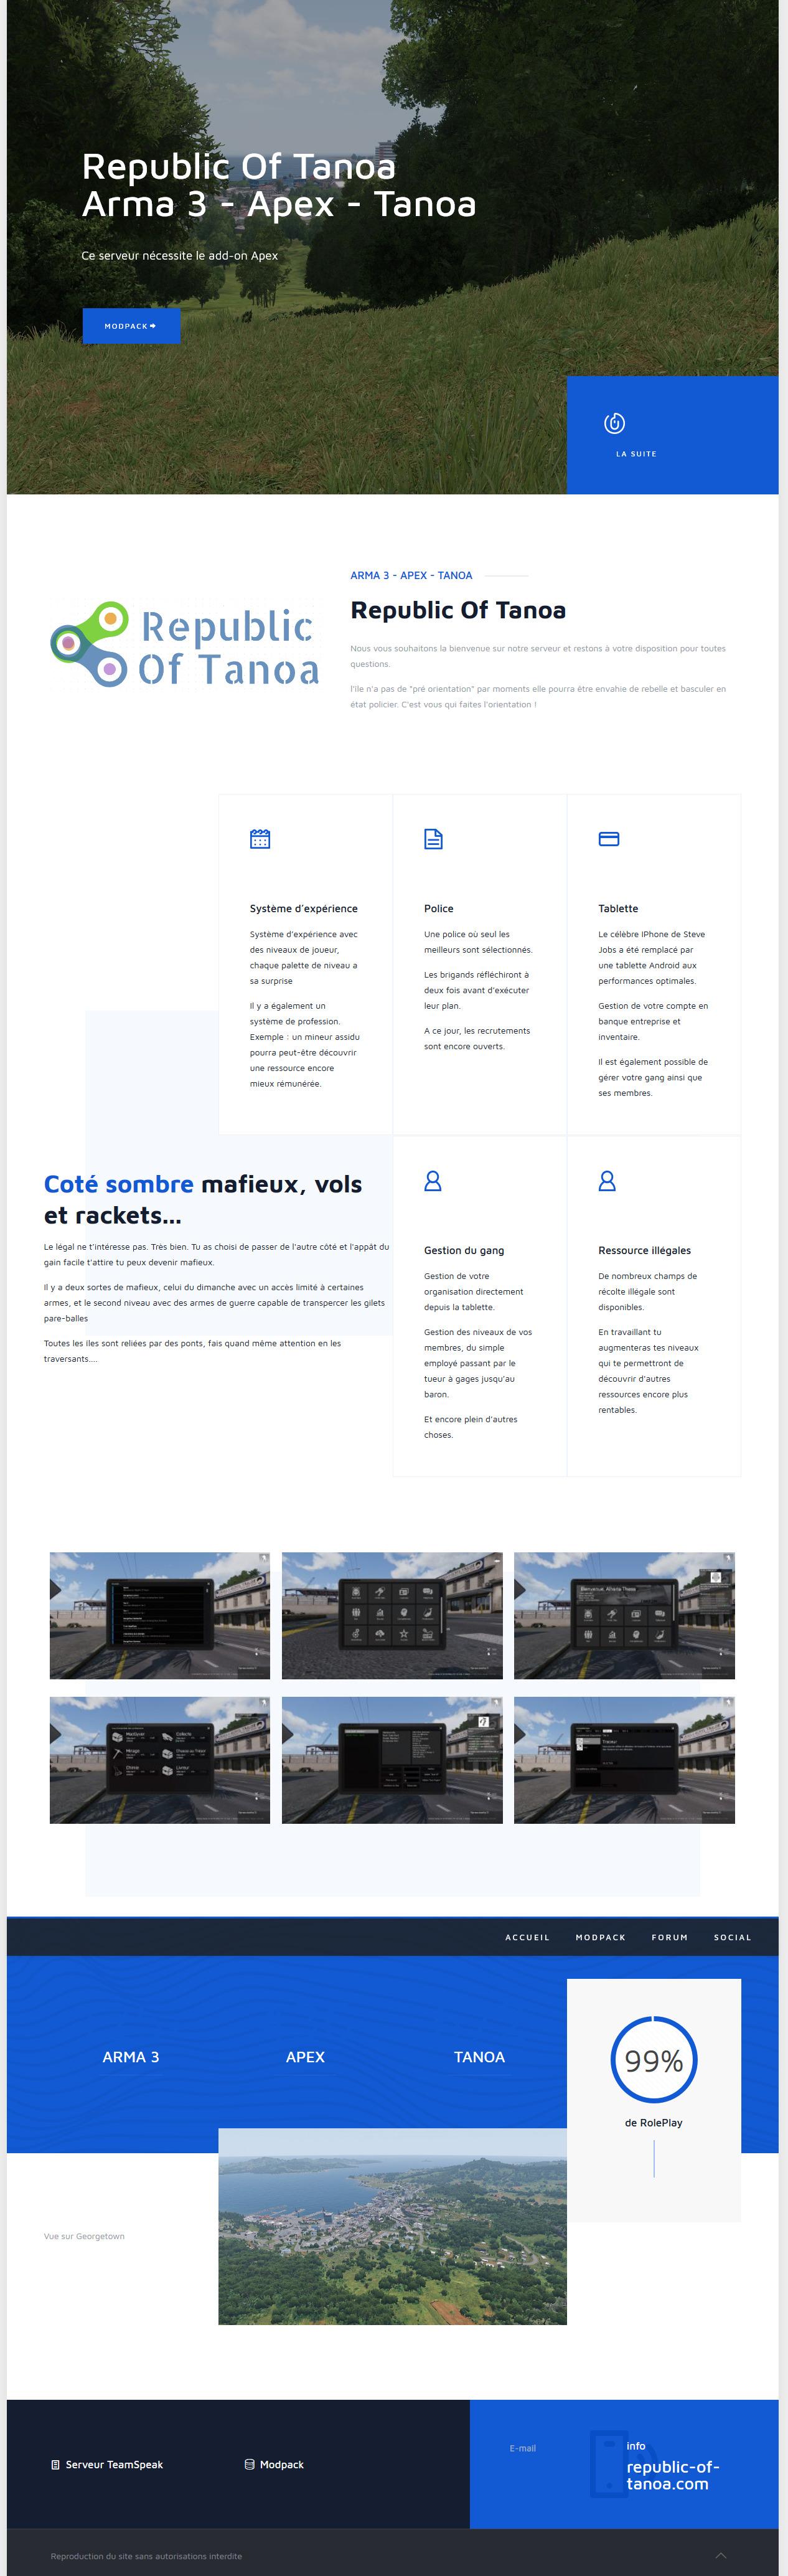 5d2cd86a14129-Screenshot_2019-07-15 Accueil - Republic Of Tanoa.jpg